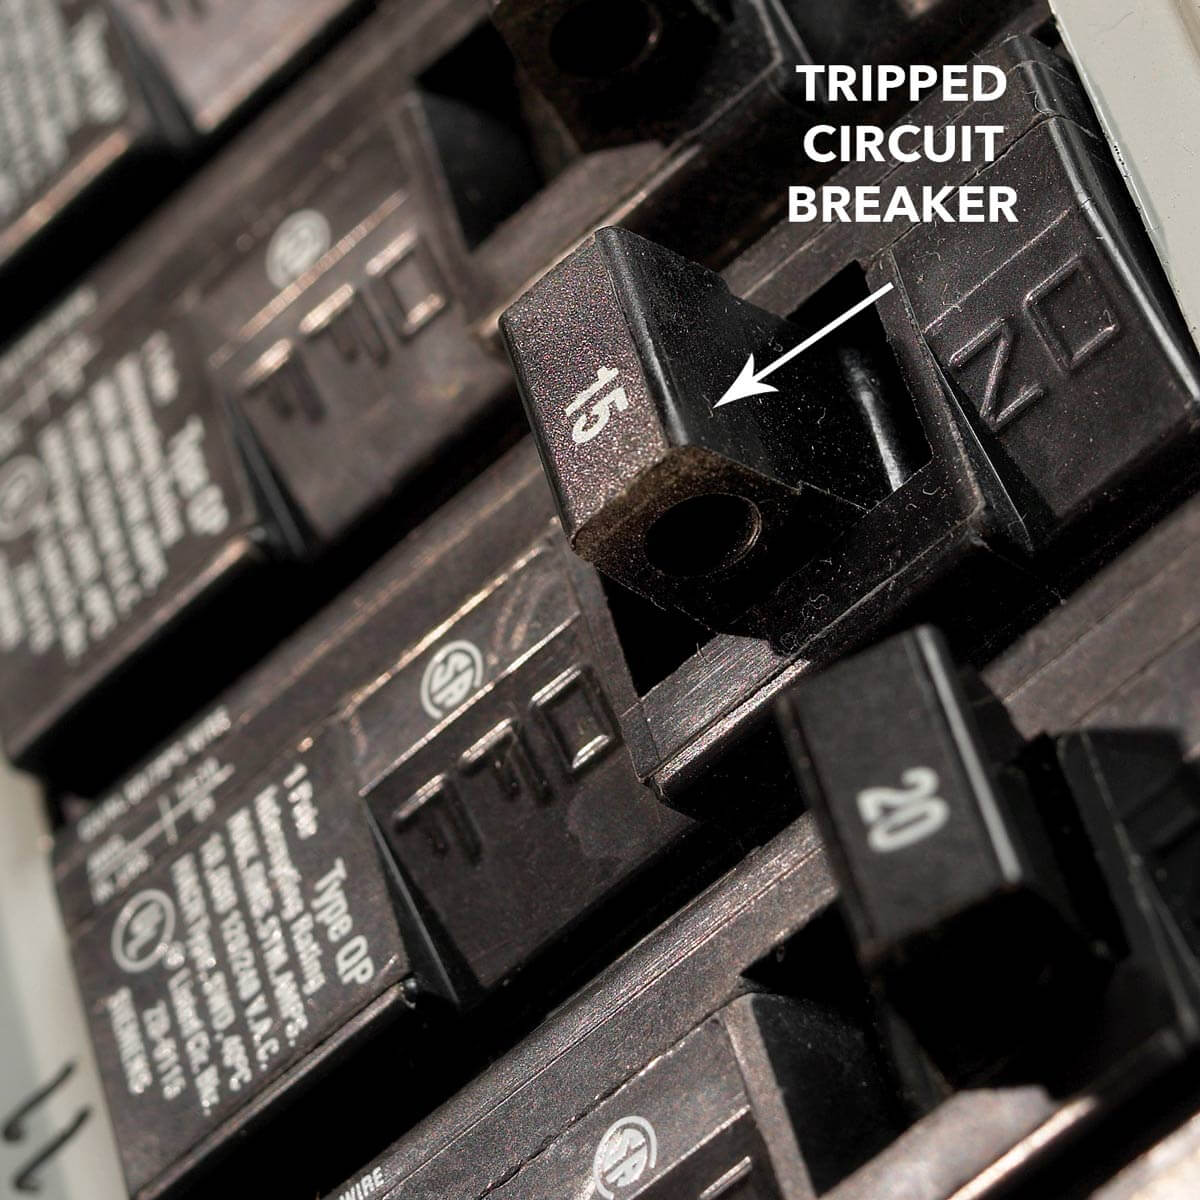 Tripped circuit breaker